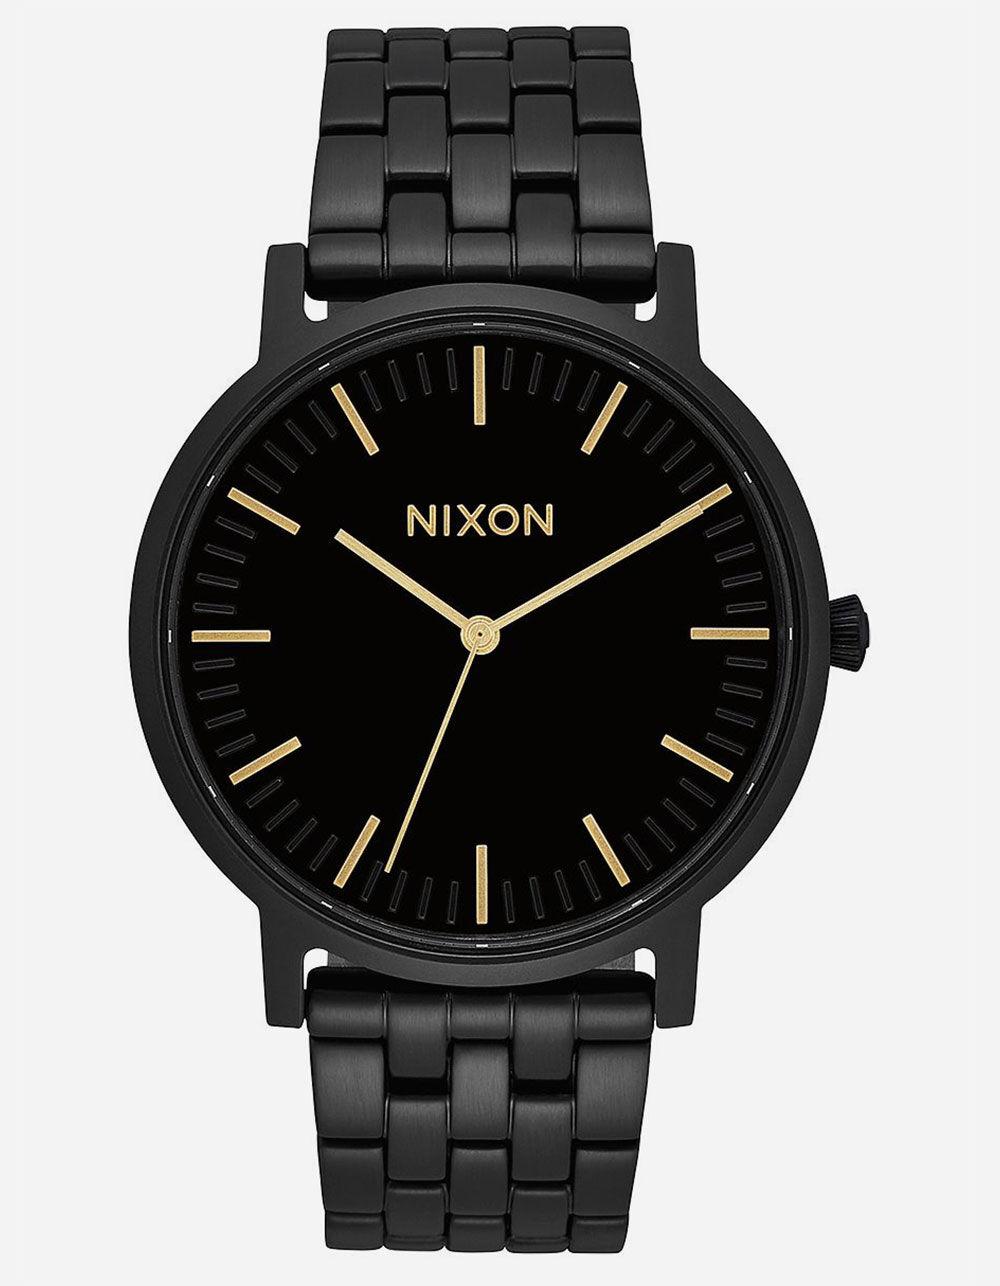 NIXON Porter Black & Gold Watch